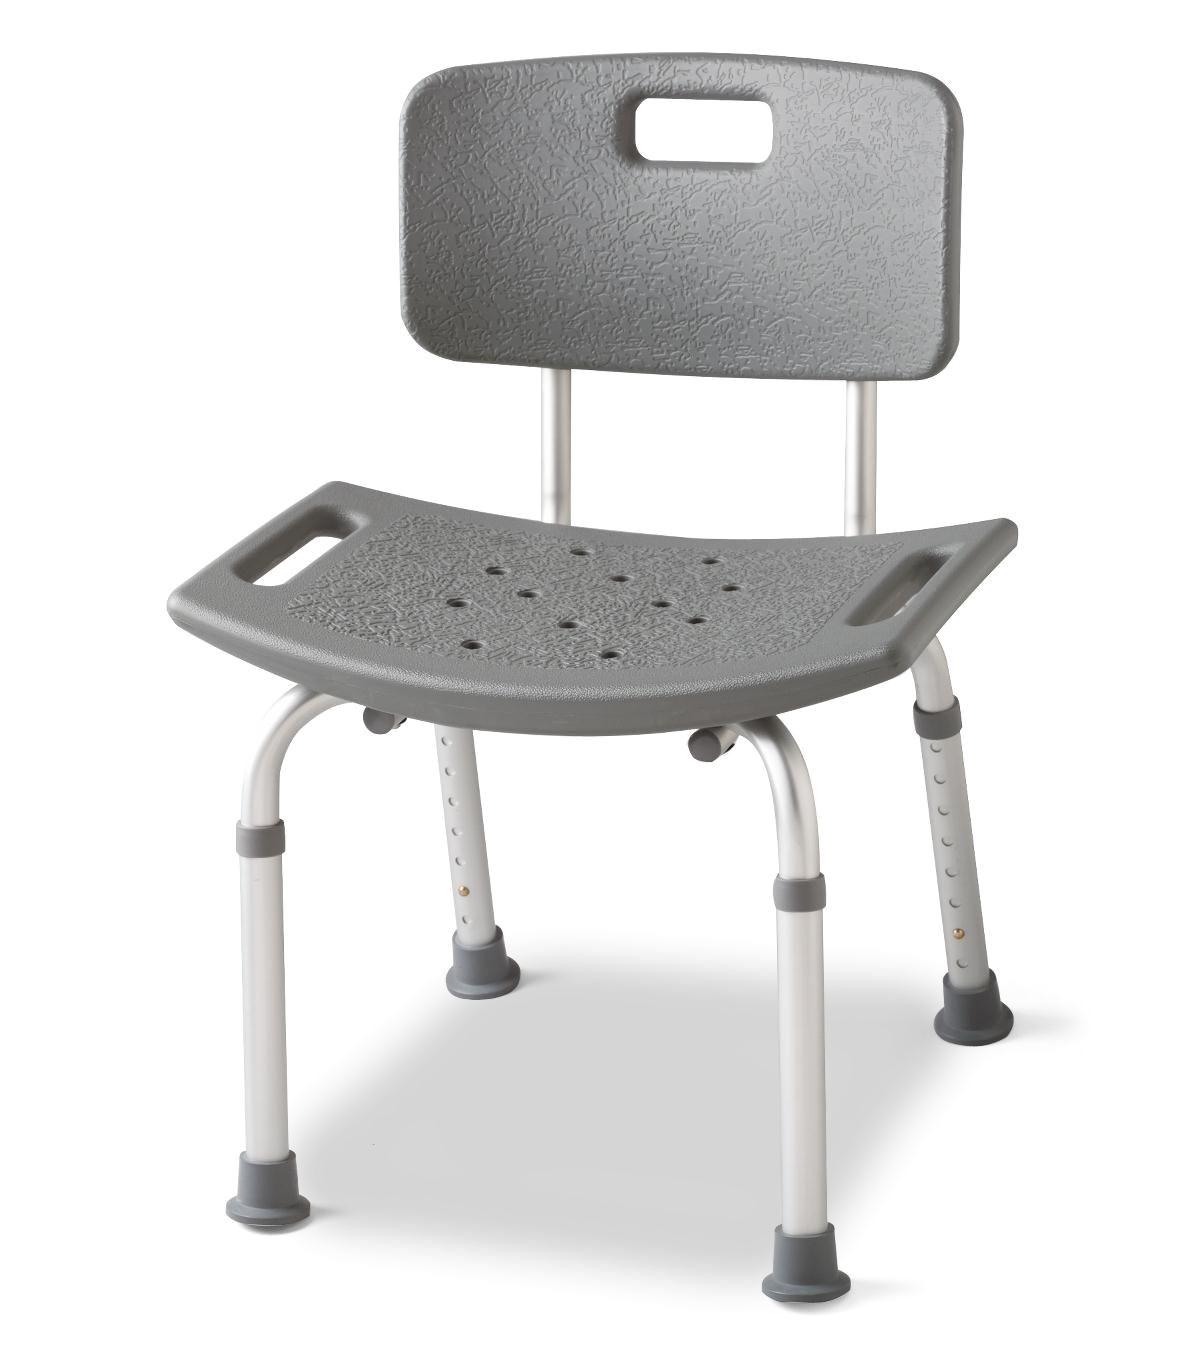 Shower Benches for Disabled Bath Seat for Elderly Handicap Shower ...